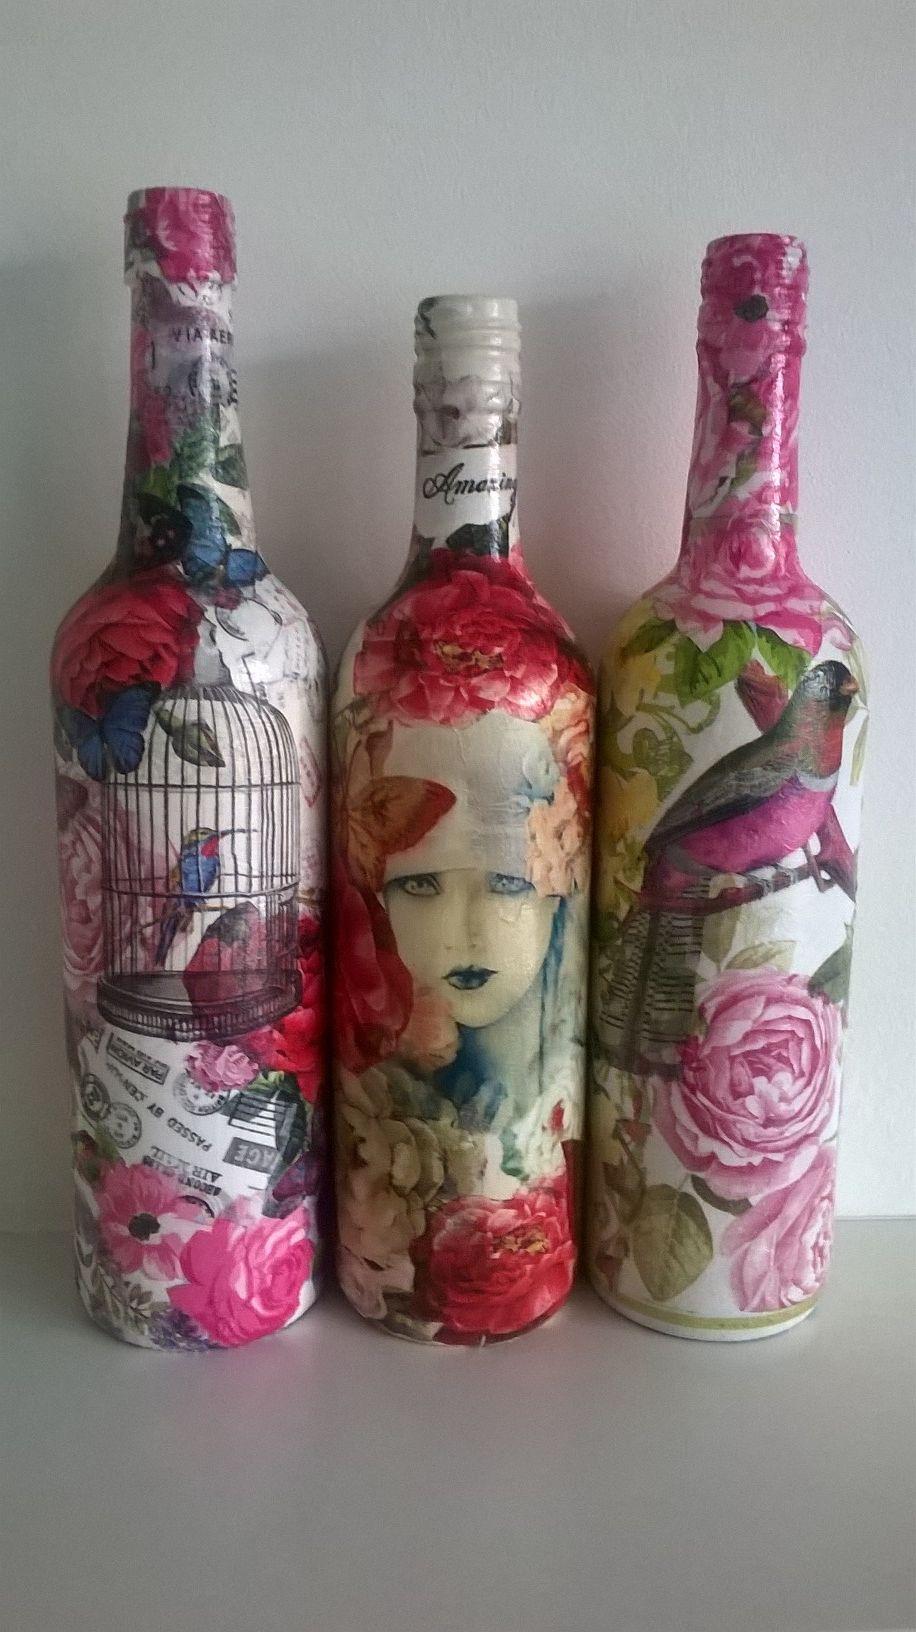 Decoupage Wine Bottles Wine Bottle Diy Crafts Wine Bottle Decor Wine Bottle Crafts